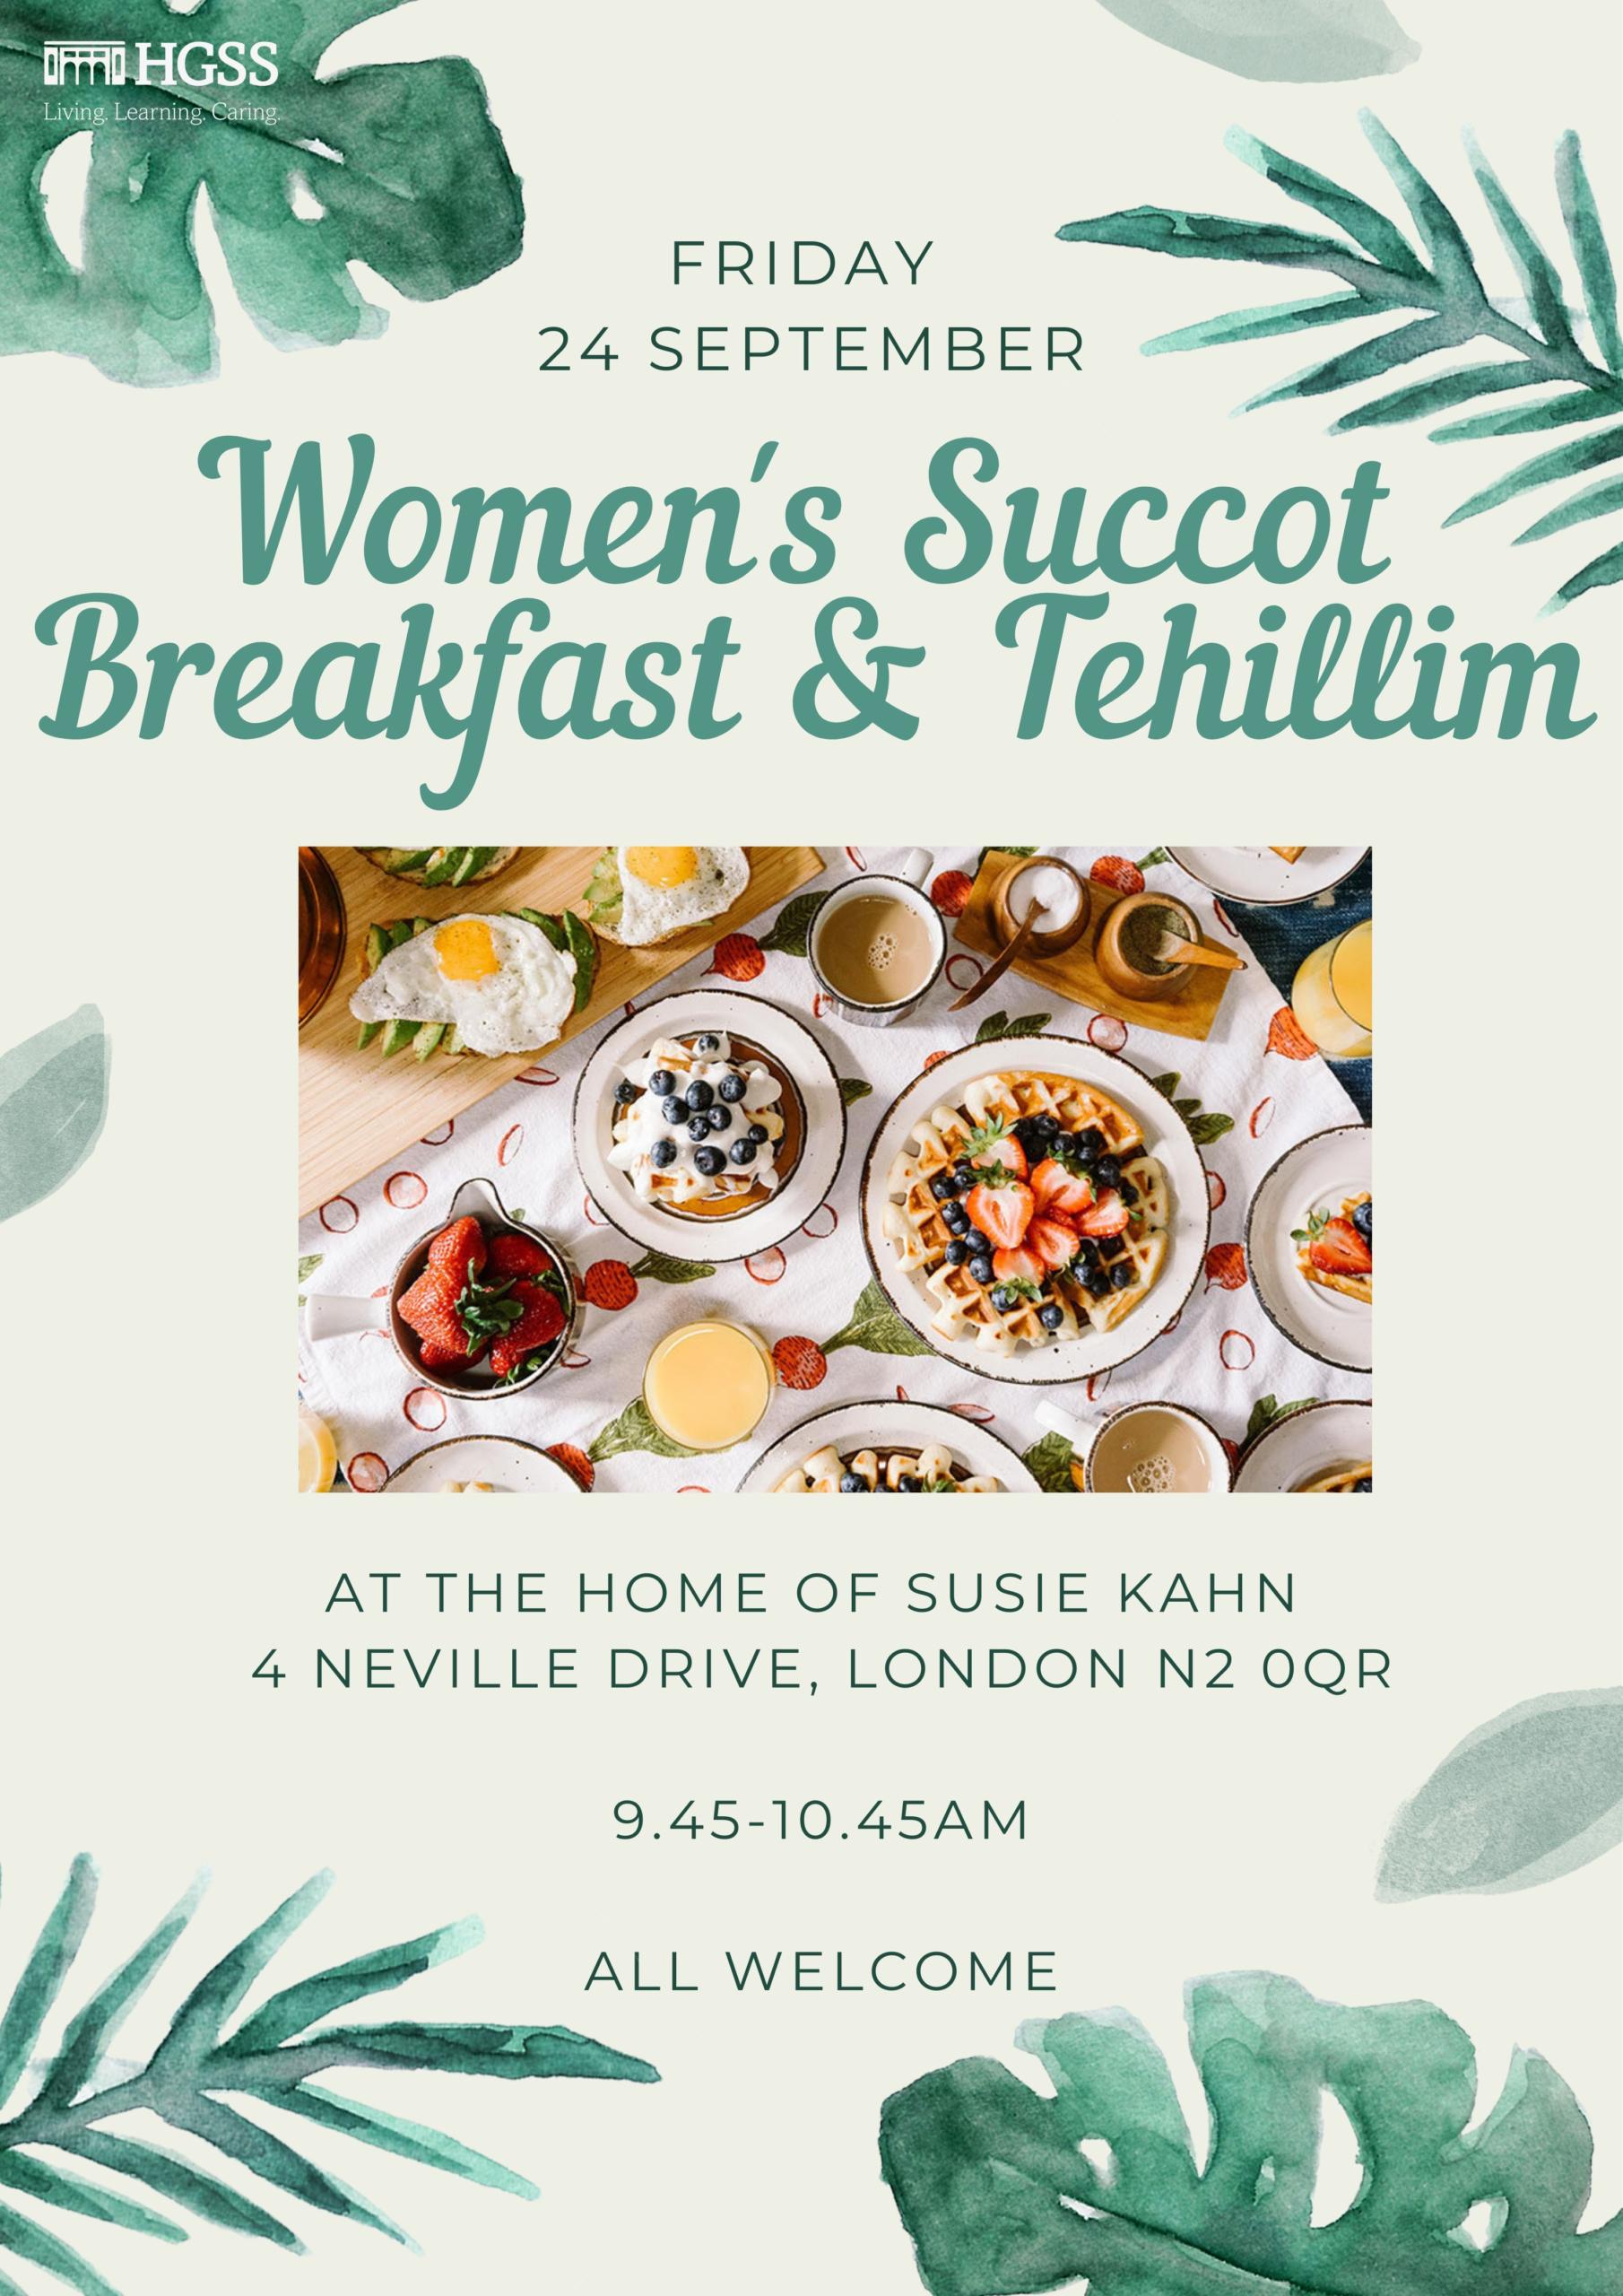 Succot Breakfast Tehillim